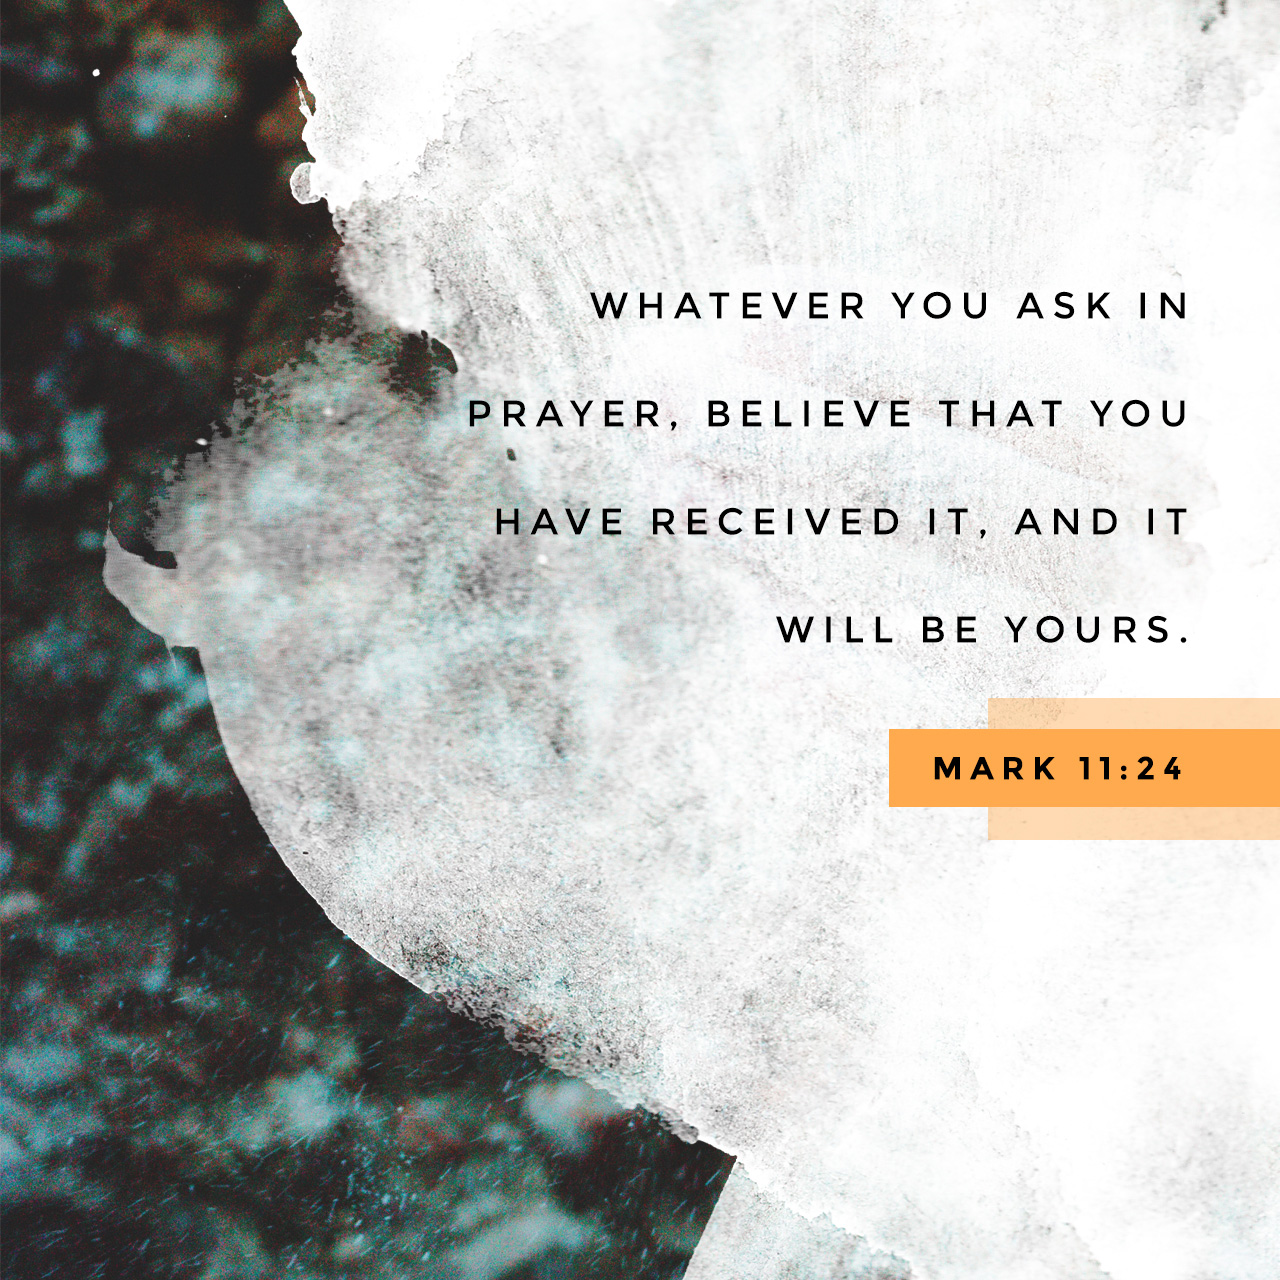 Mark 11:24 (JPG)